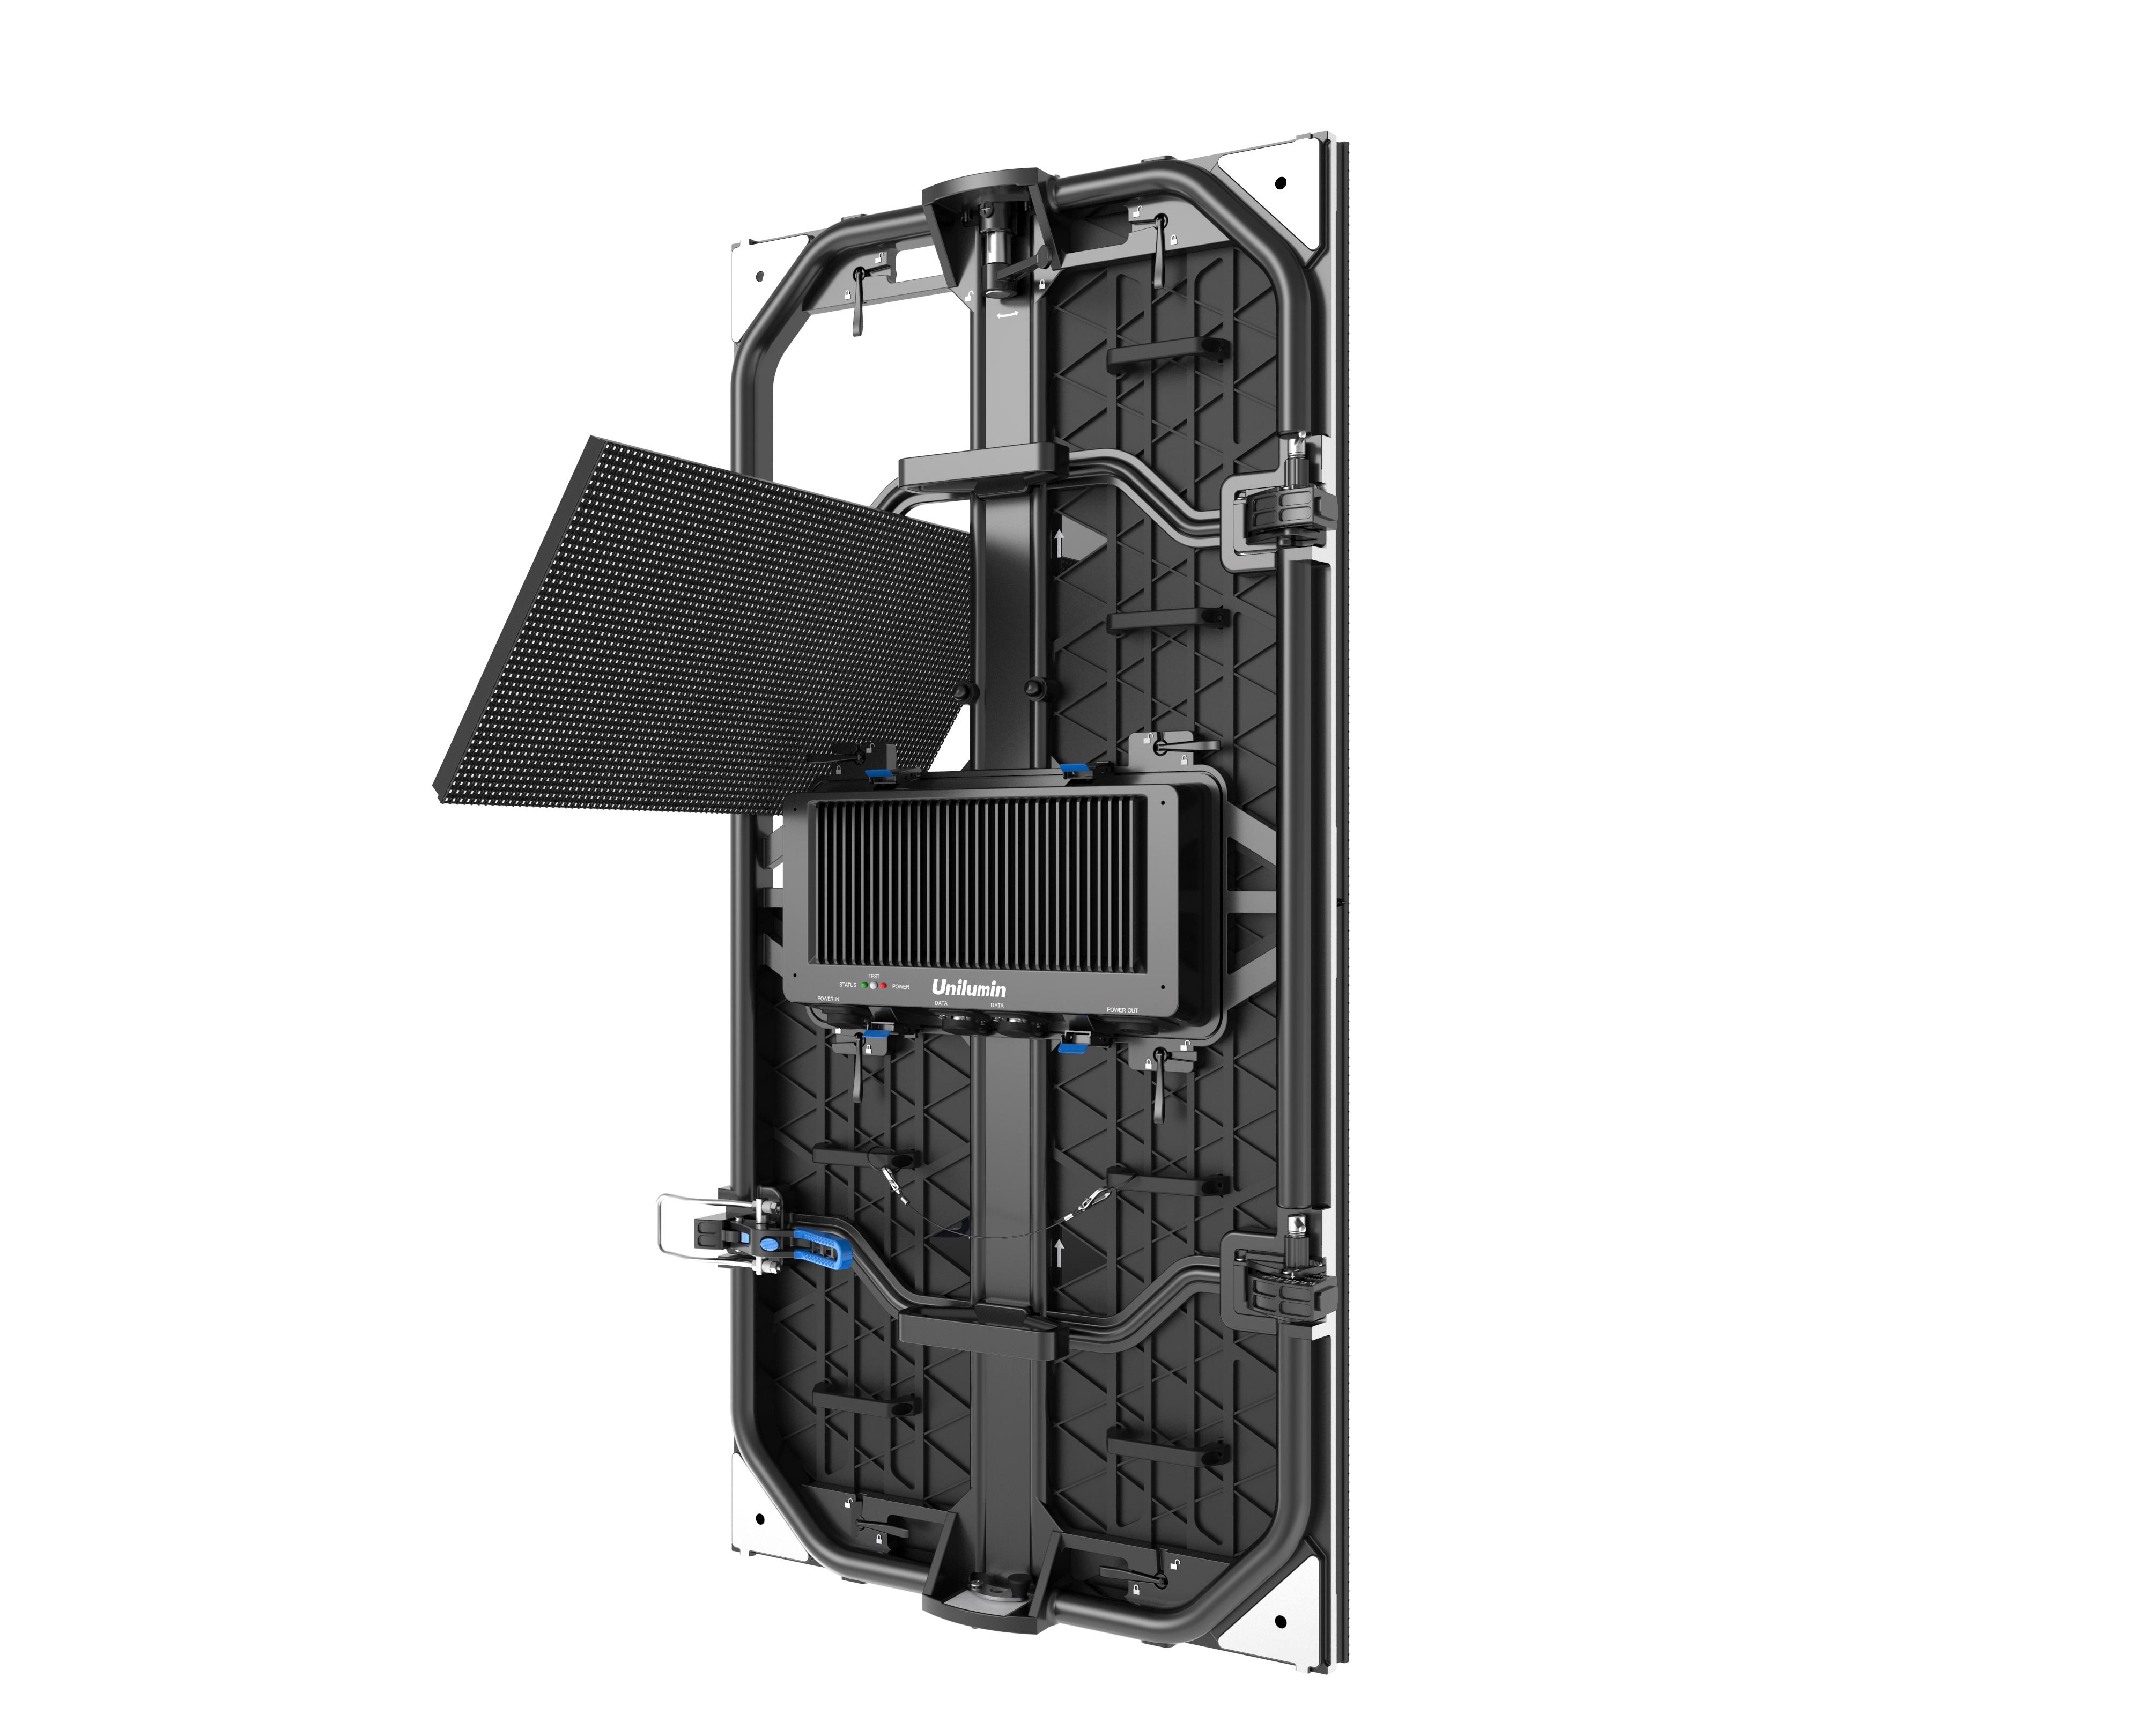 UTILE 3 rental led virtual production